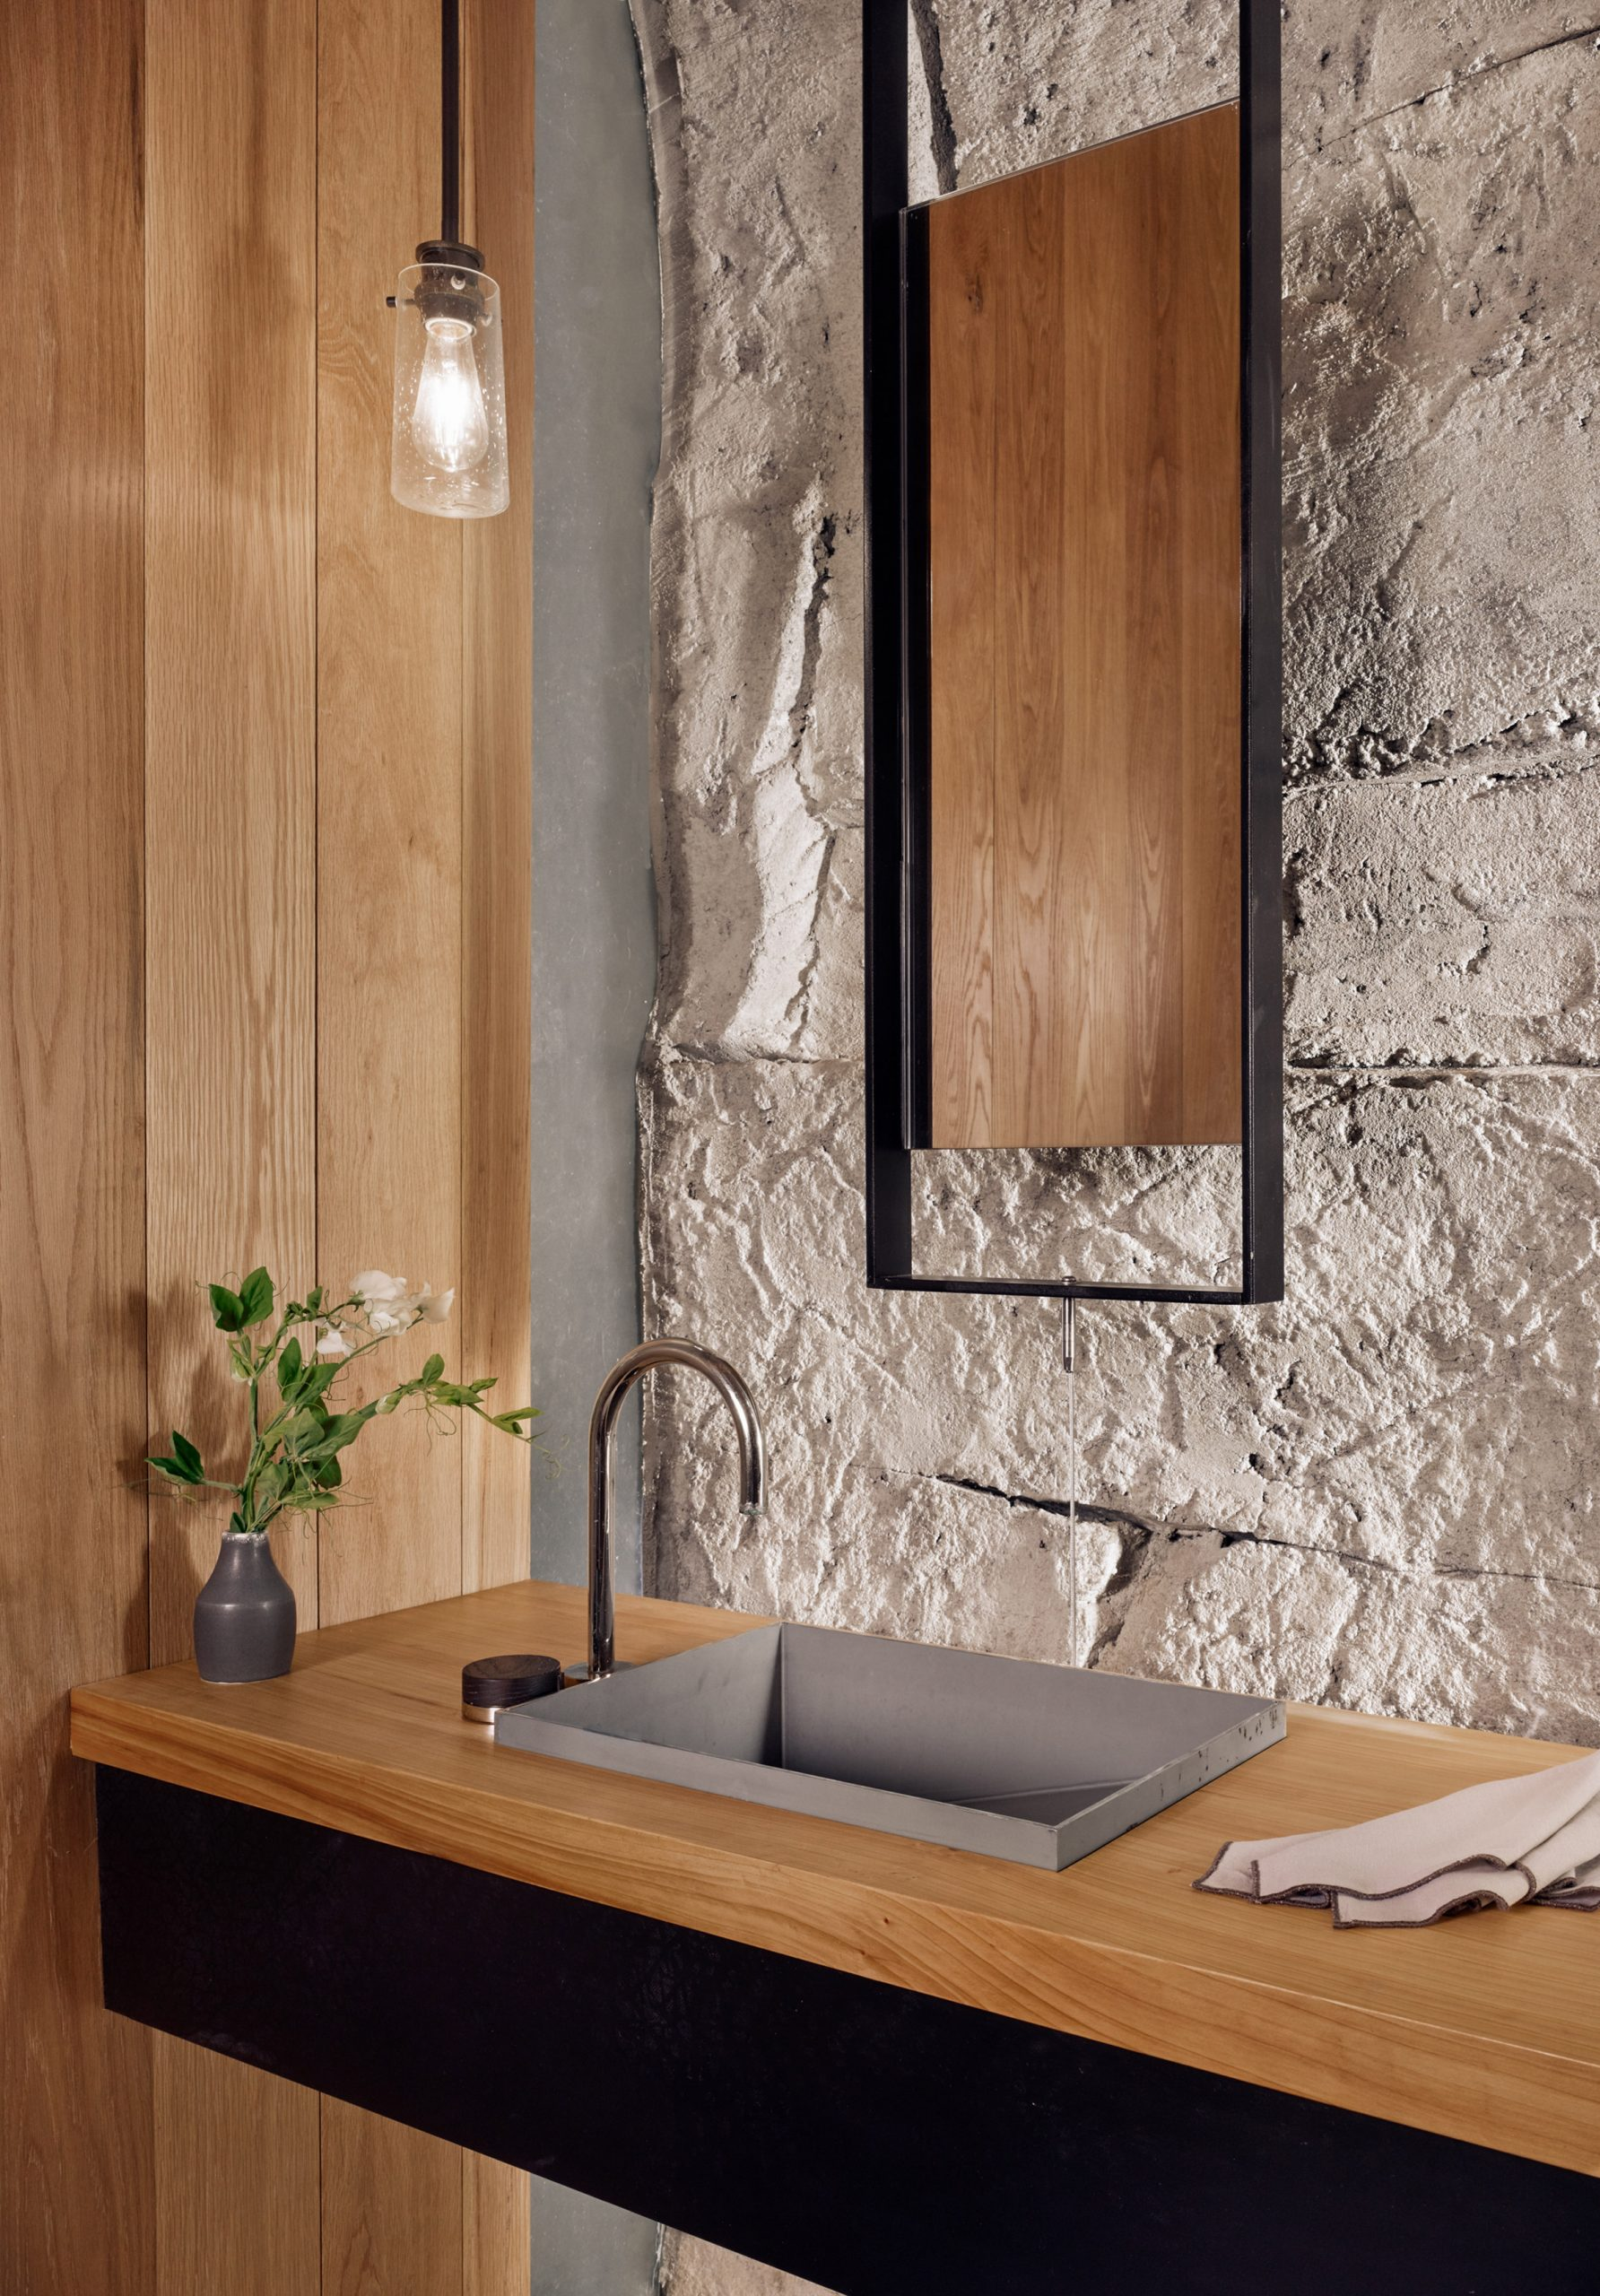 Bathroom with sprayed concrete walls in a Texas wine cellar